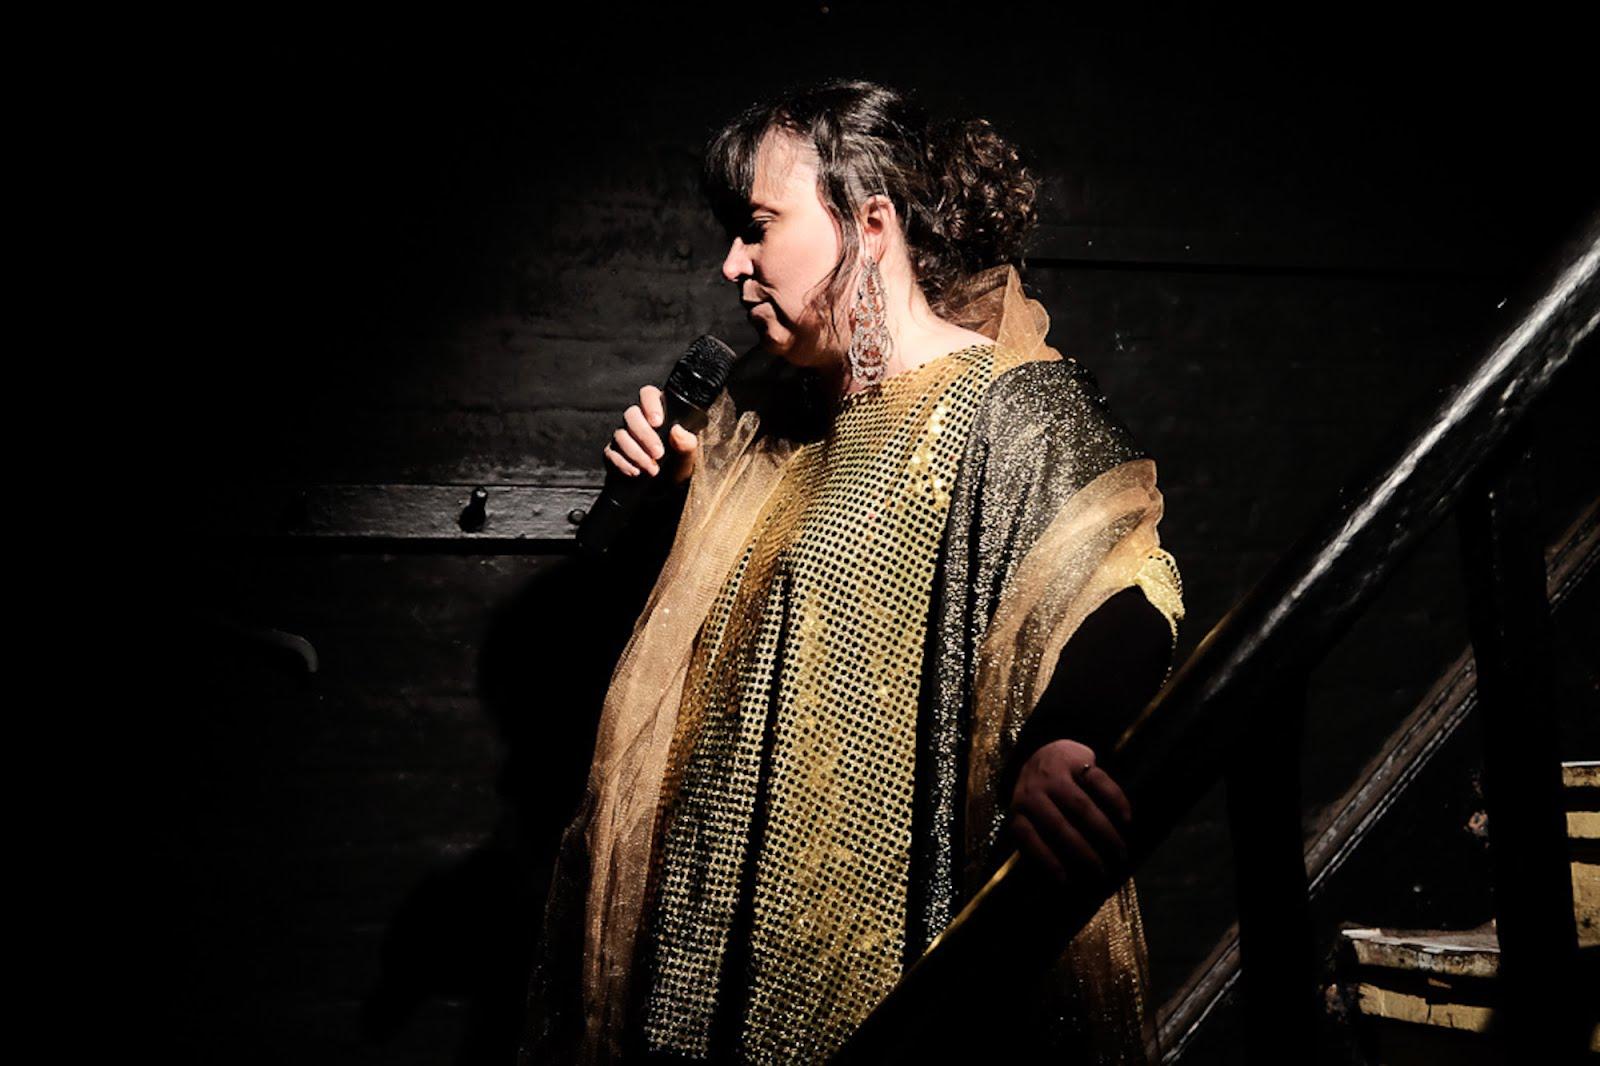 BIPOLAR KARAOKE - A woman's story in song